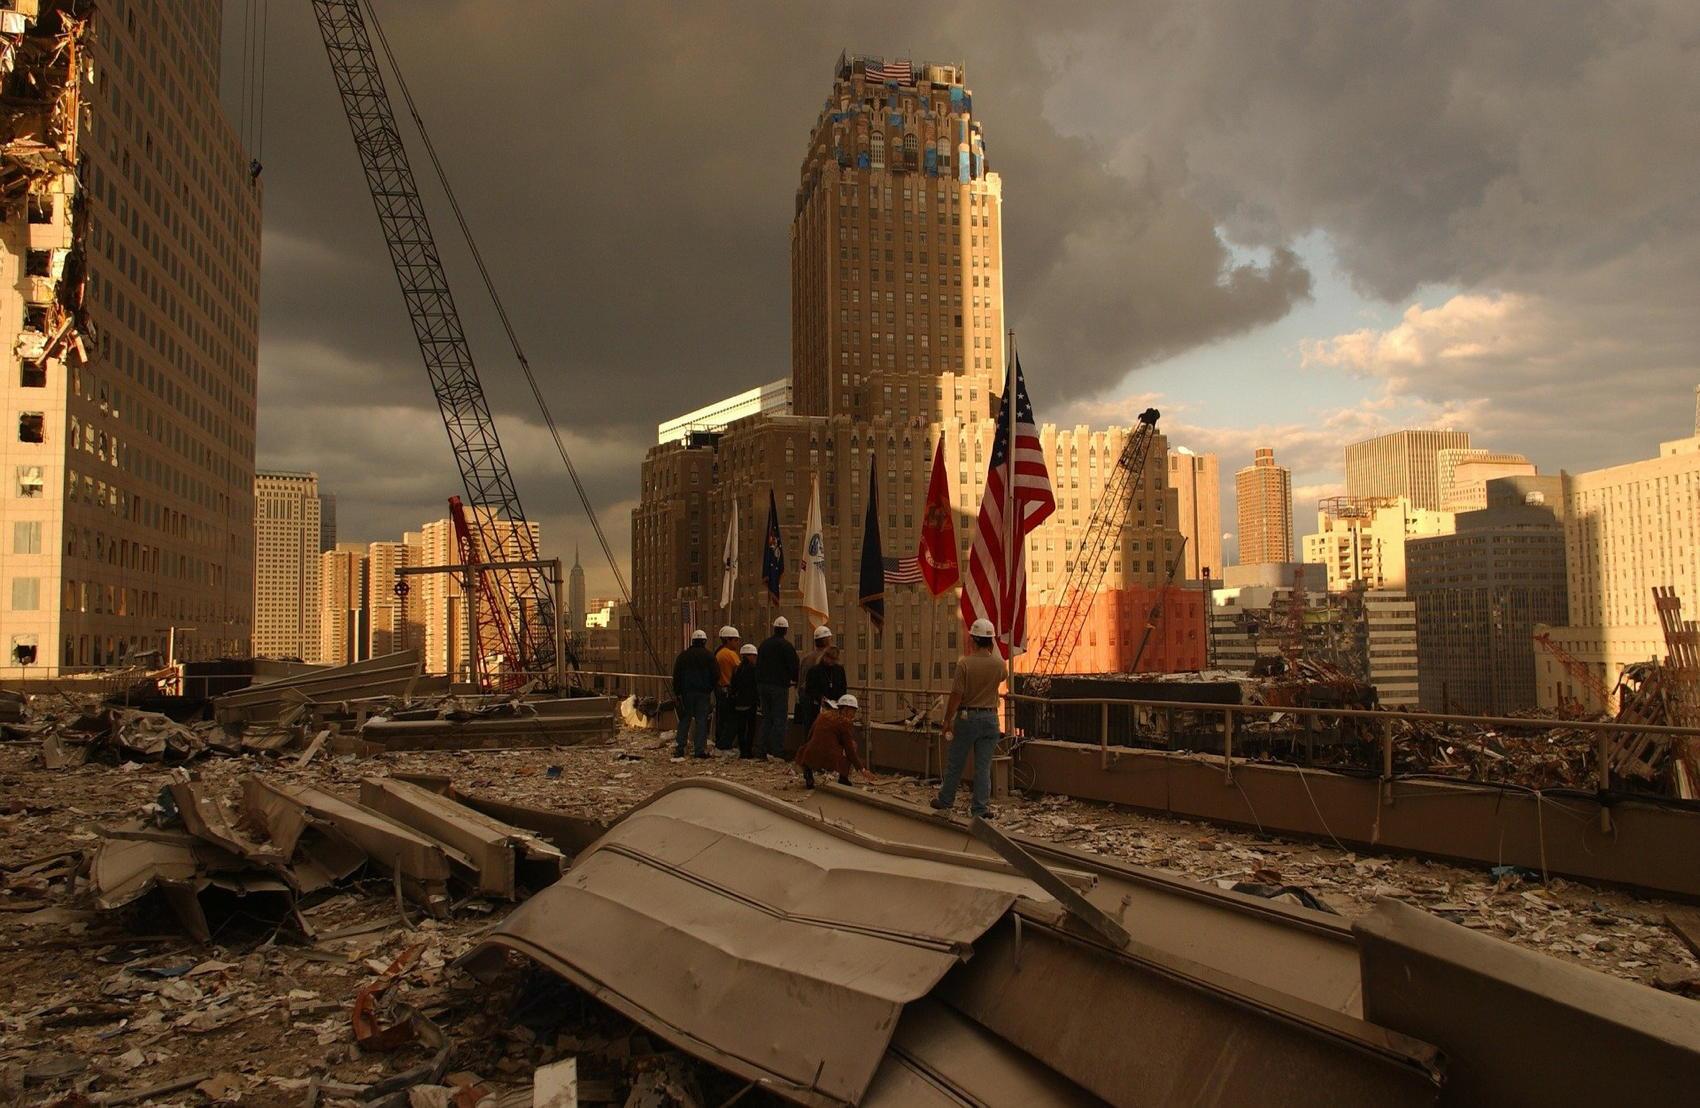 Ground Zero - Image by WikiImages